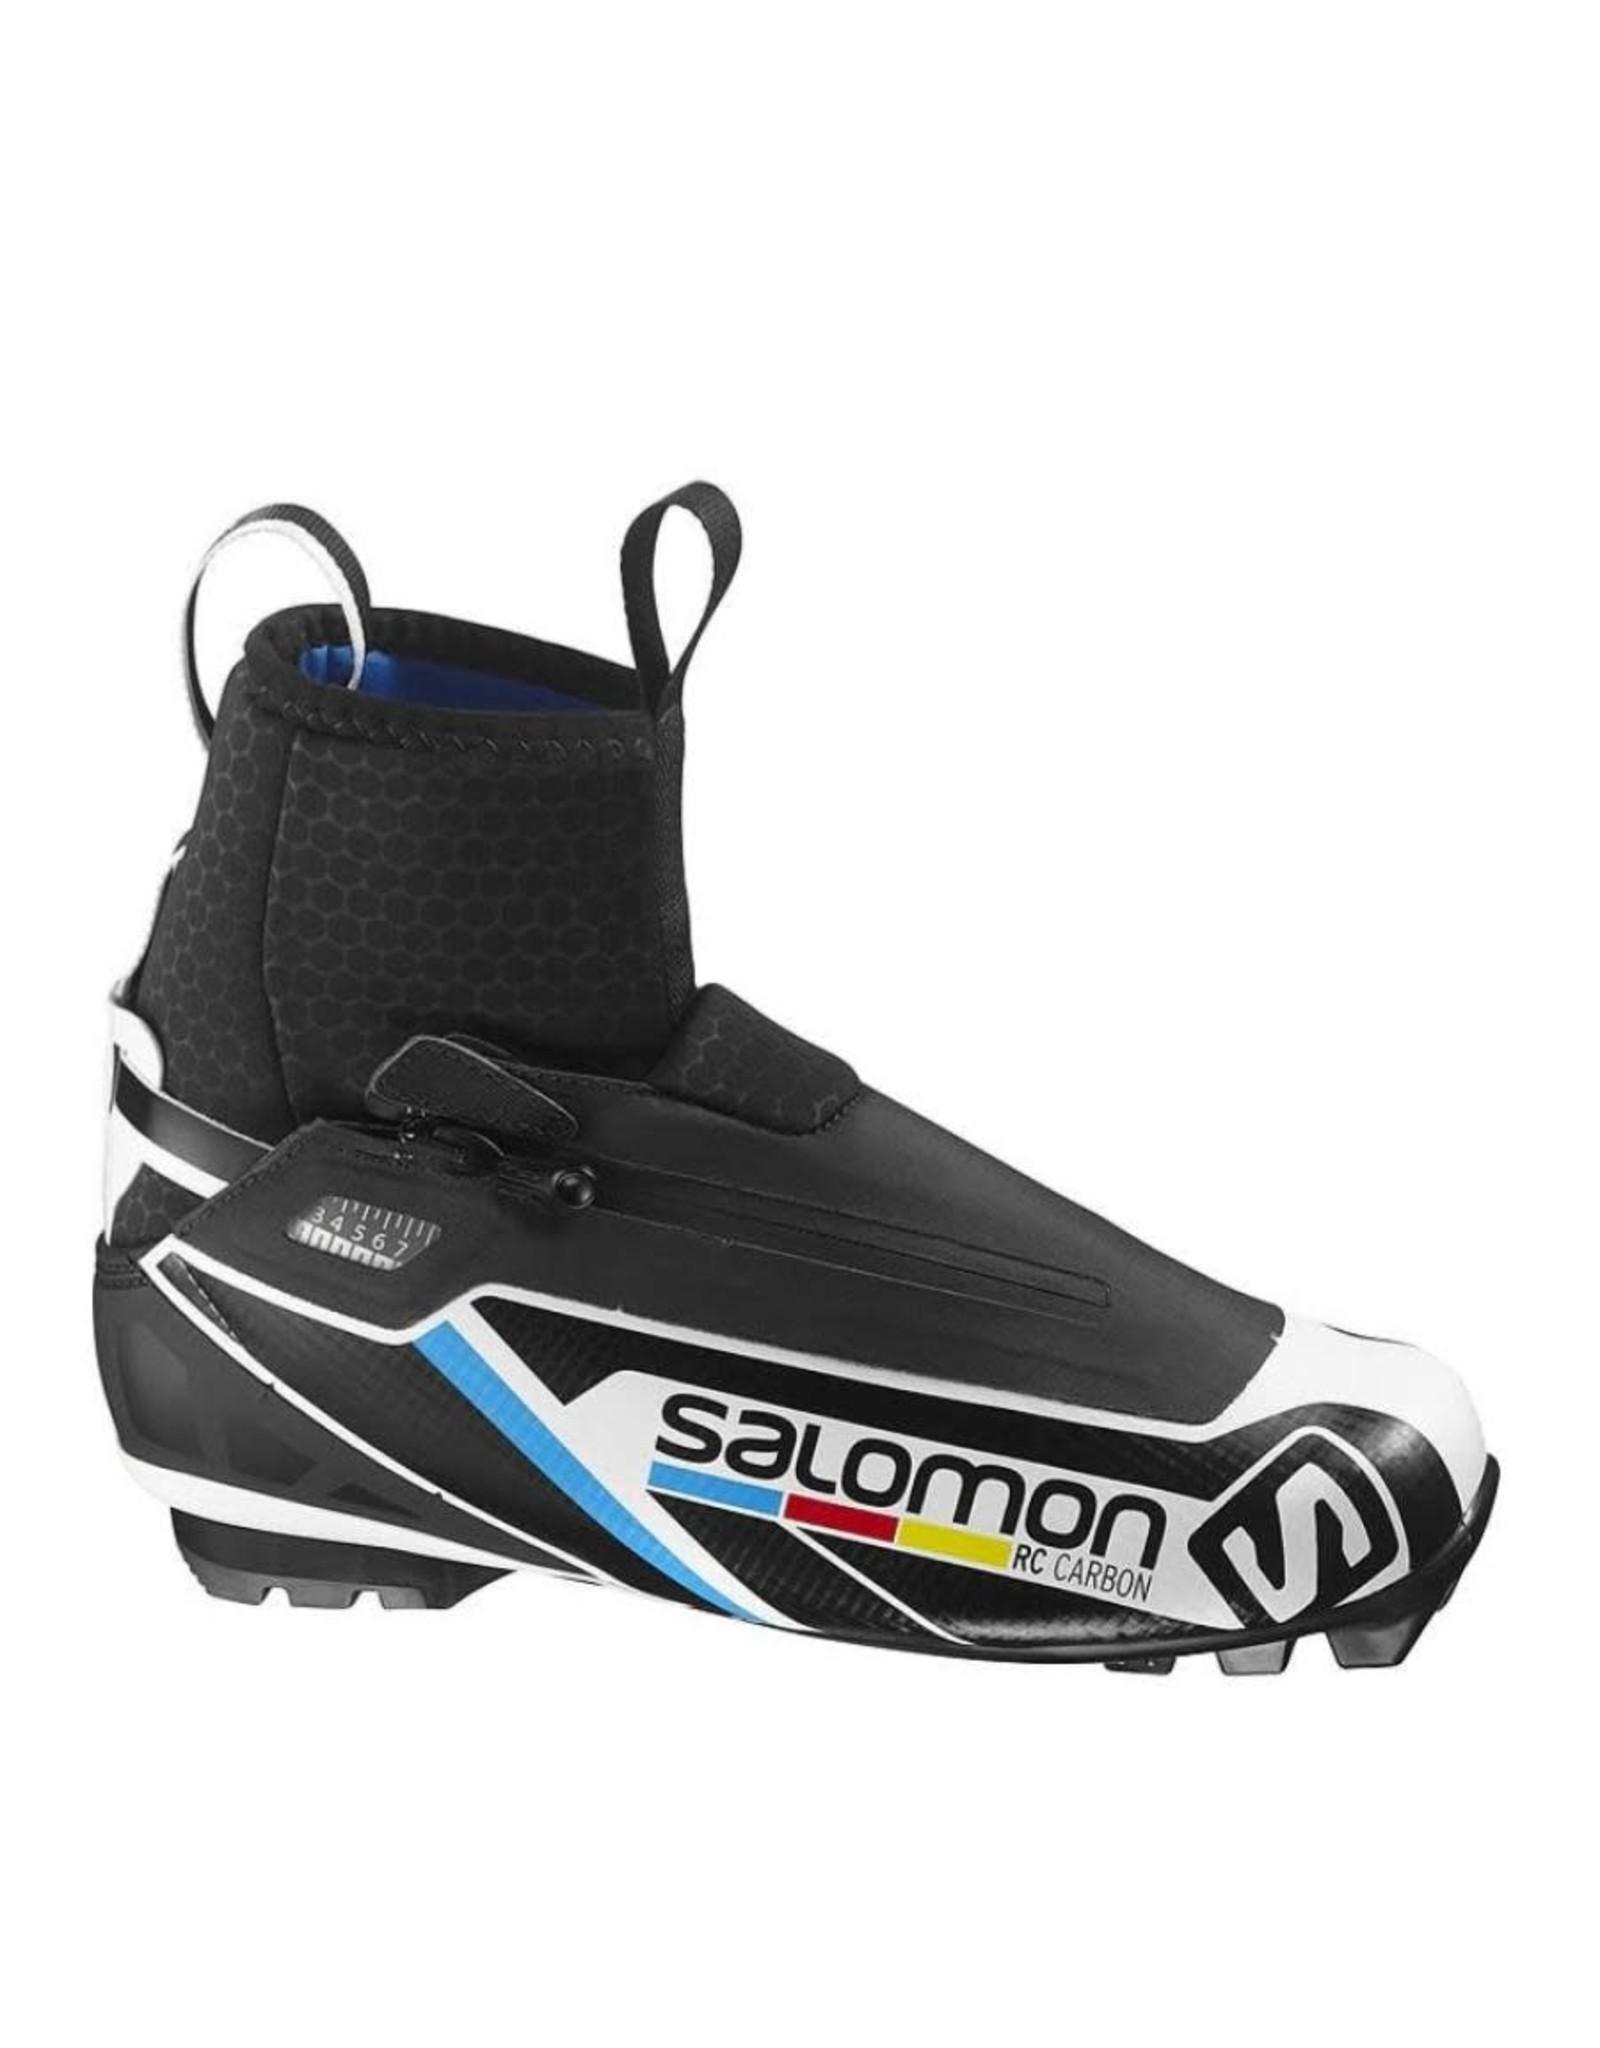 Salomon Salomon RC Carbon Prolink Classic Boot